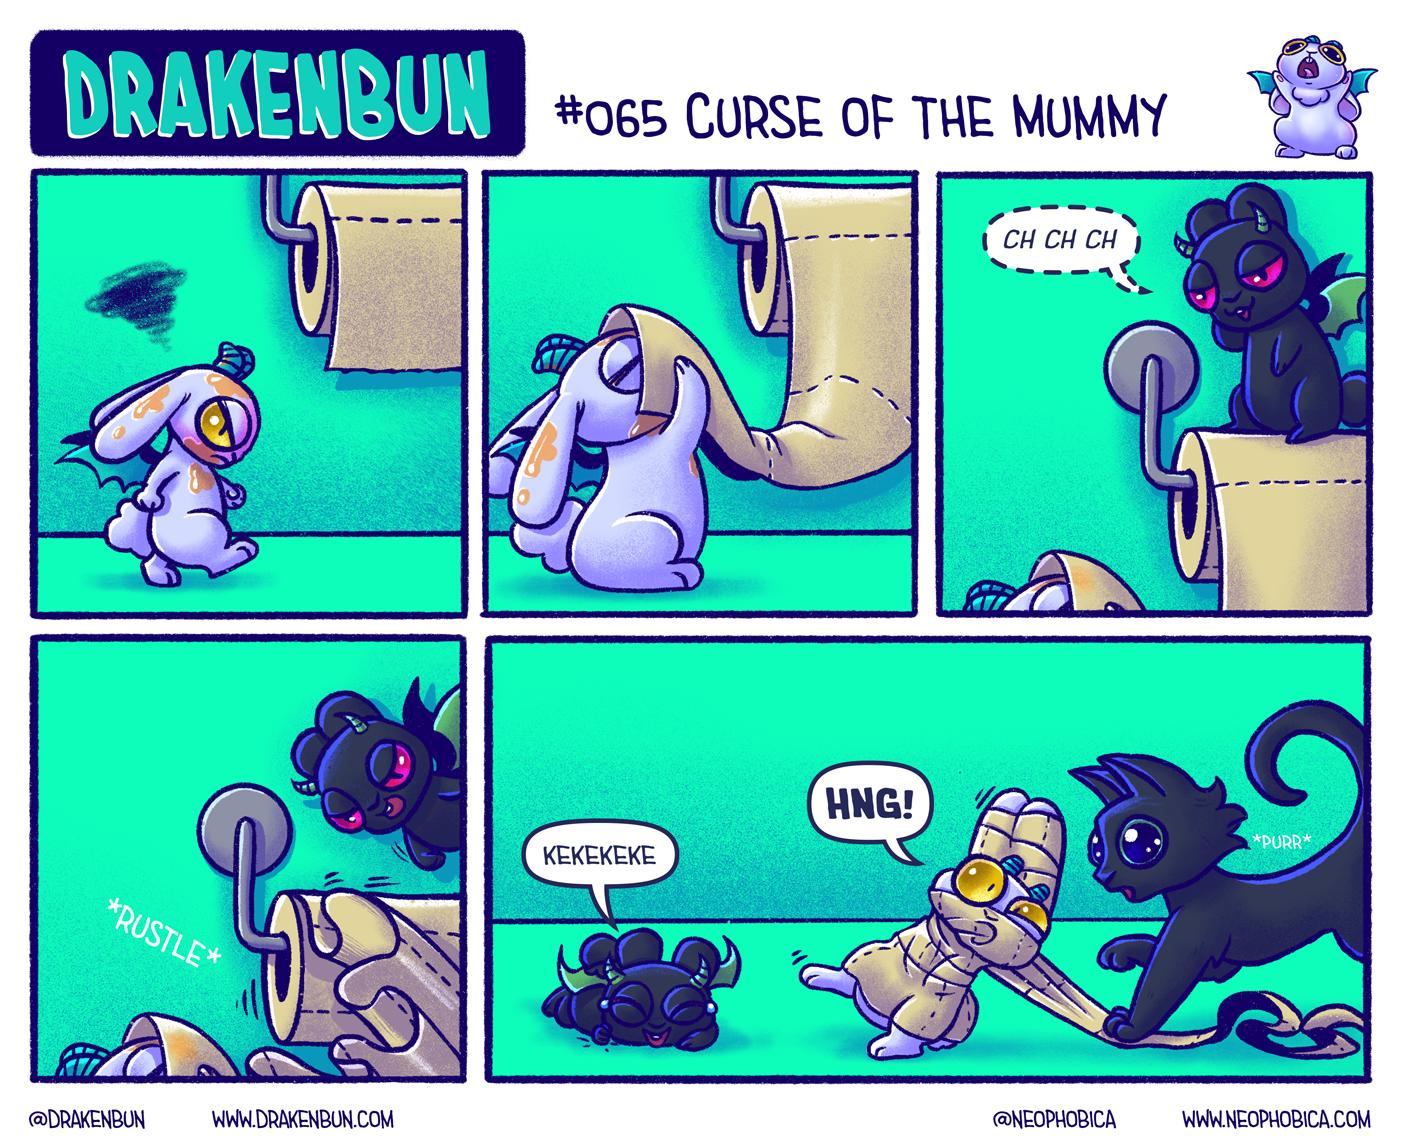 #065 Curse of the Mummy